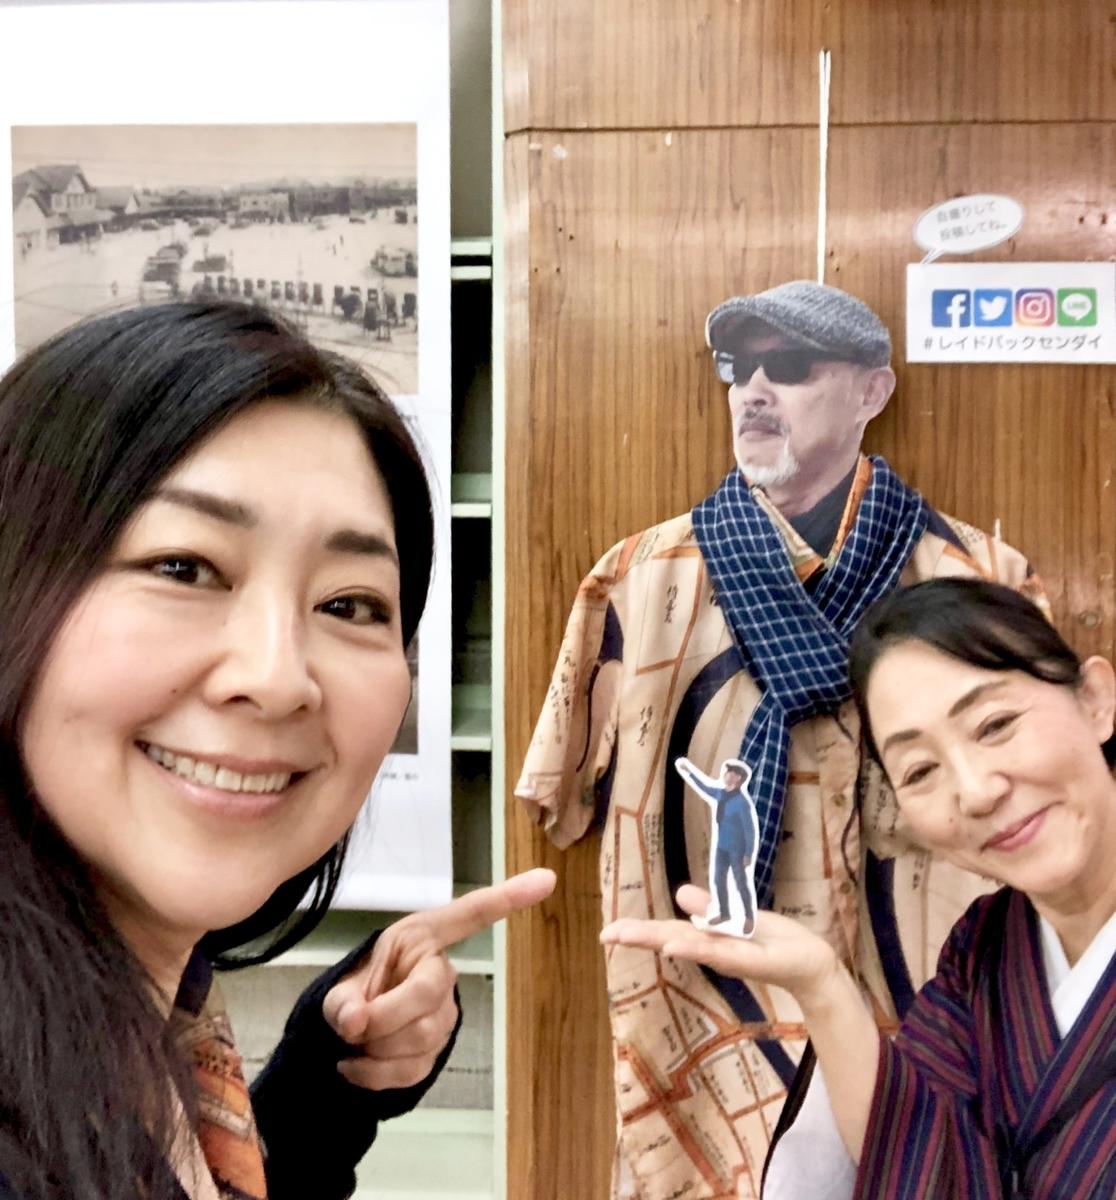 f:id:Kimidori-Inoue:20191130094849j:plain